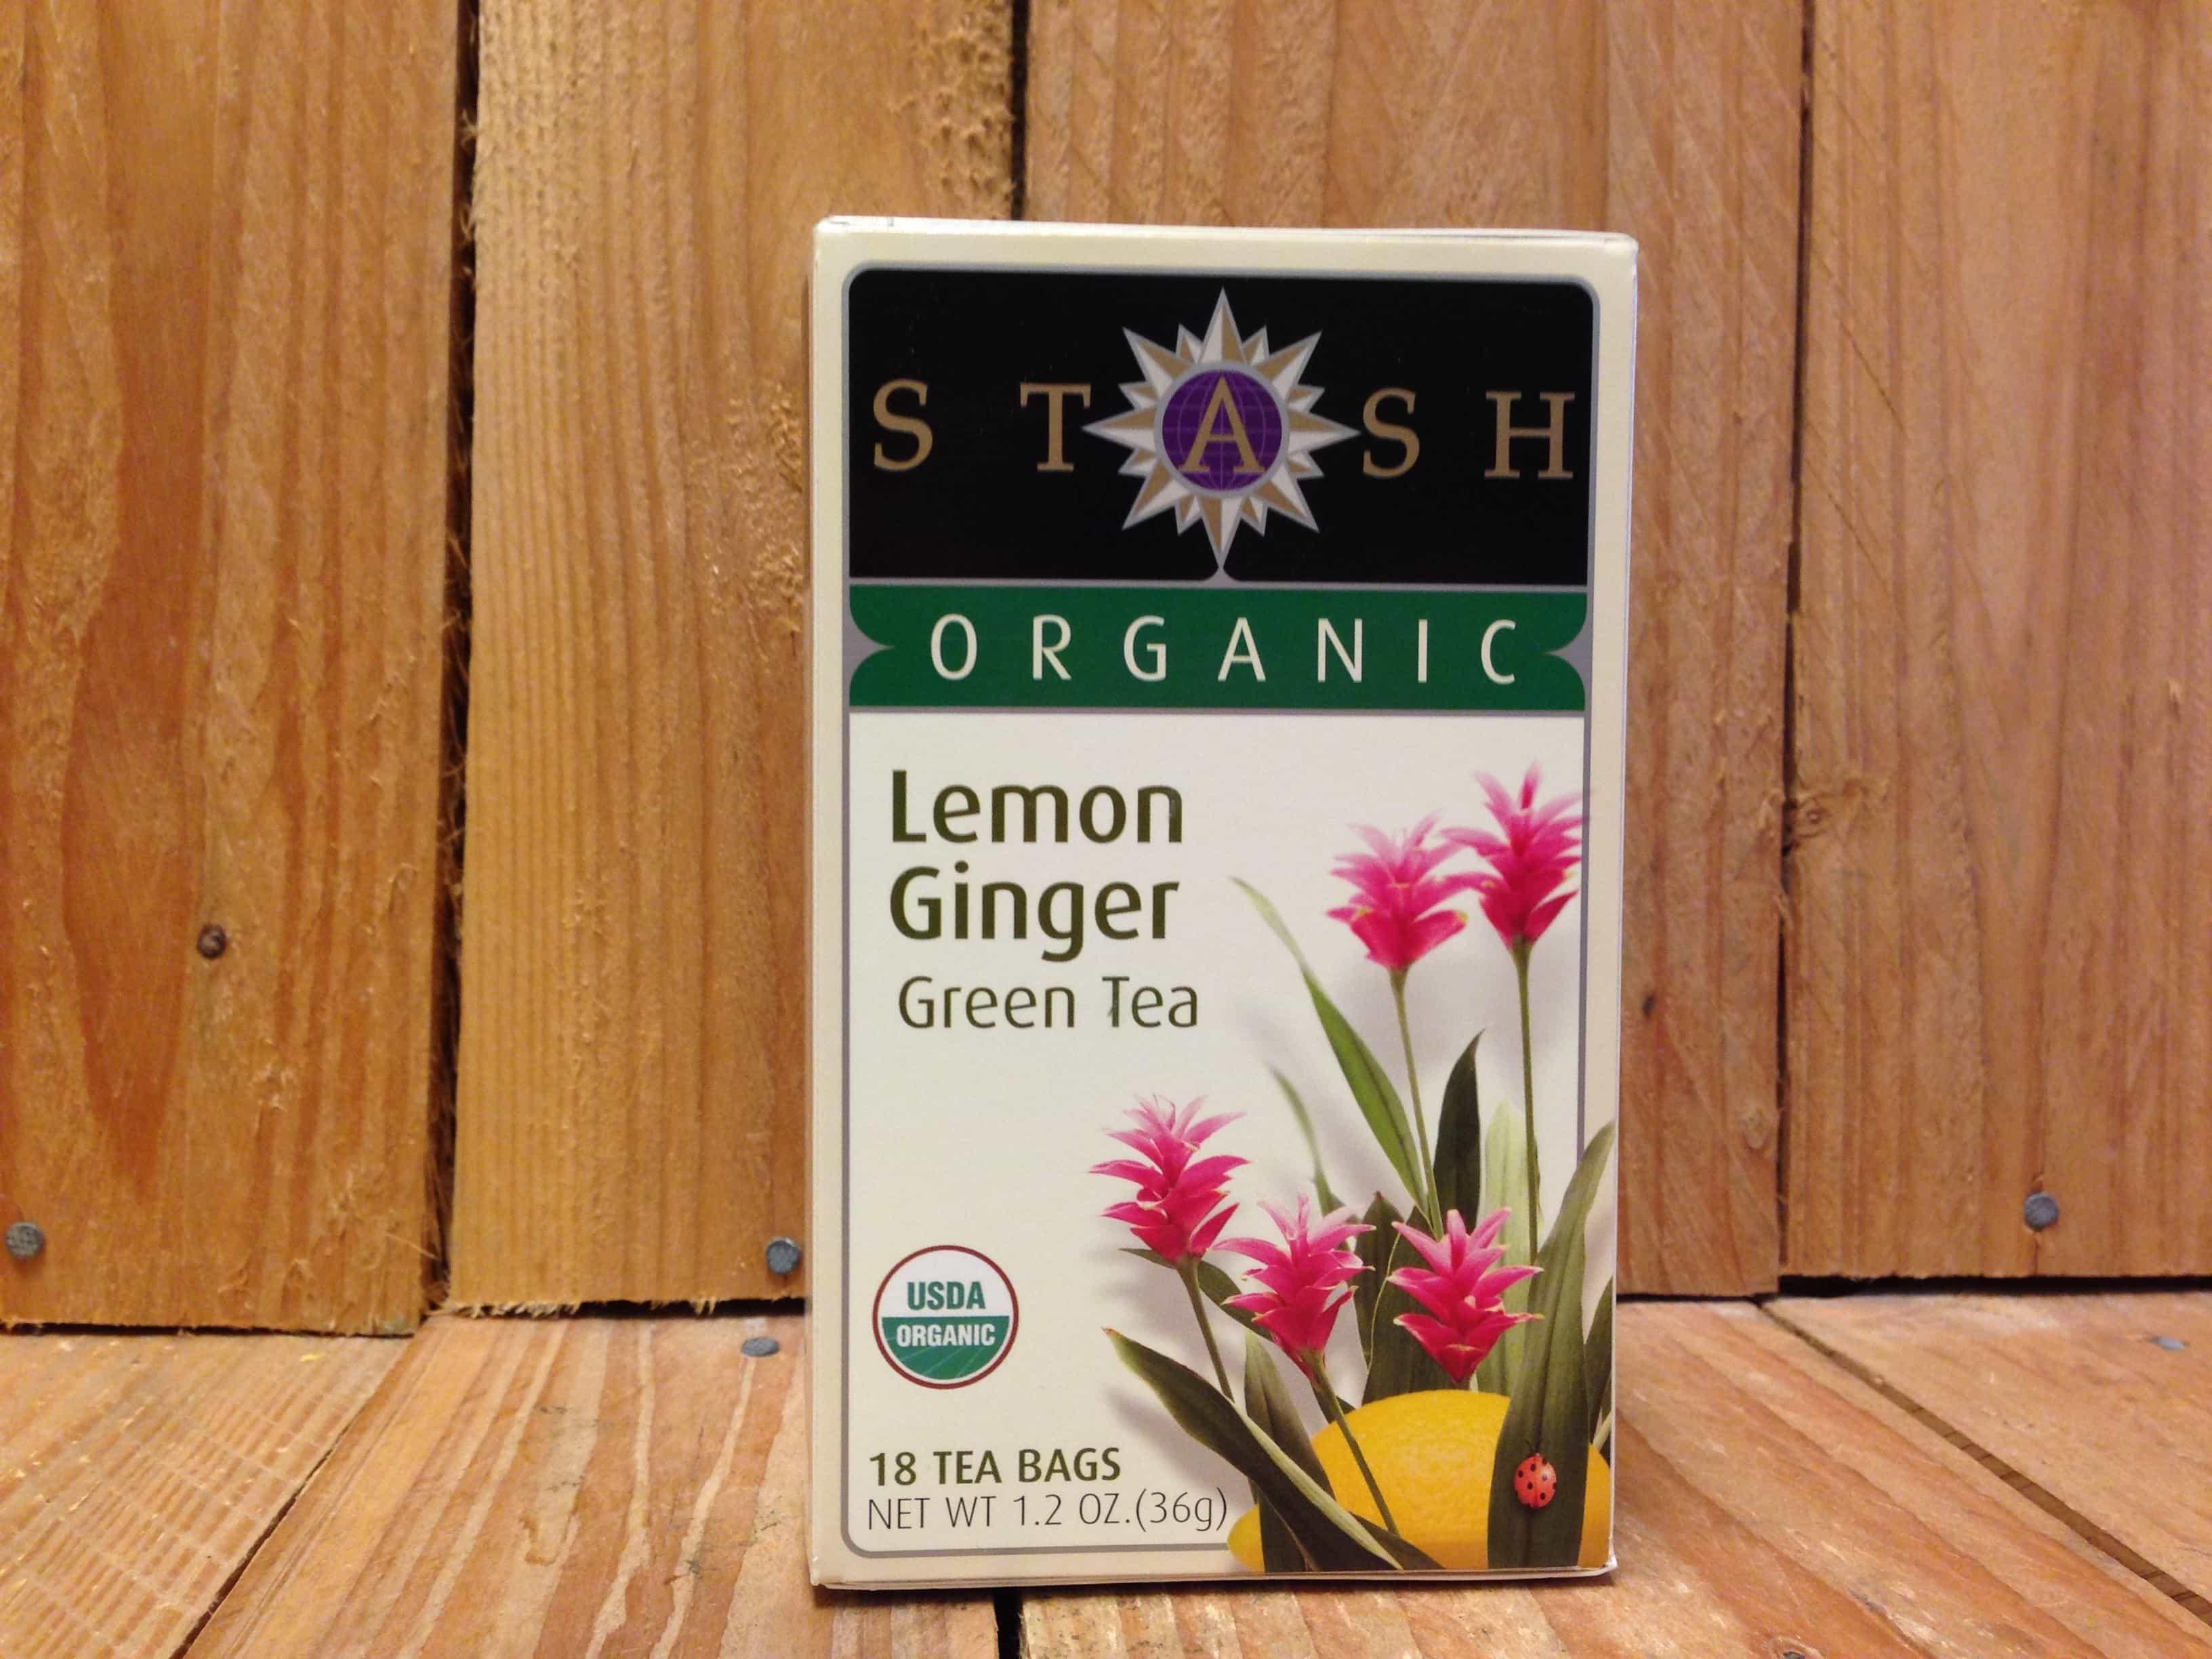 Stash – Organic Lemon Ginger Tea (18 Bags)